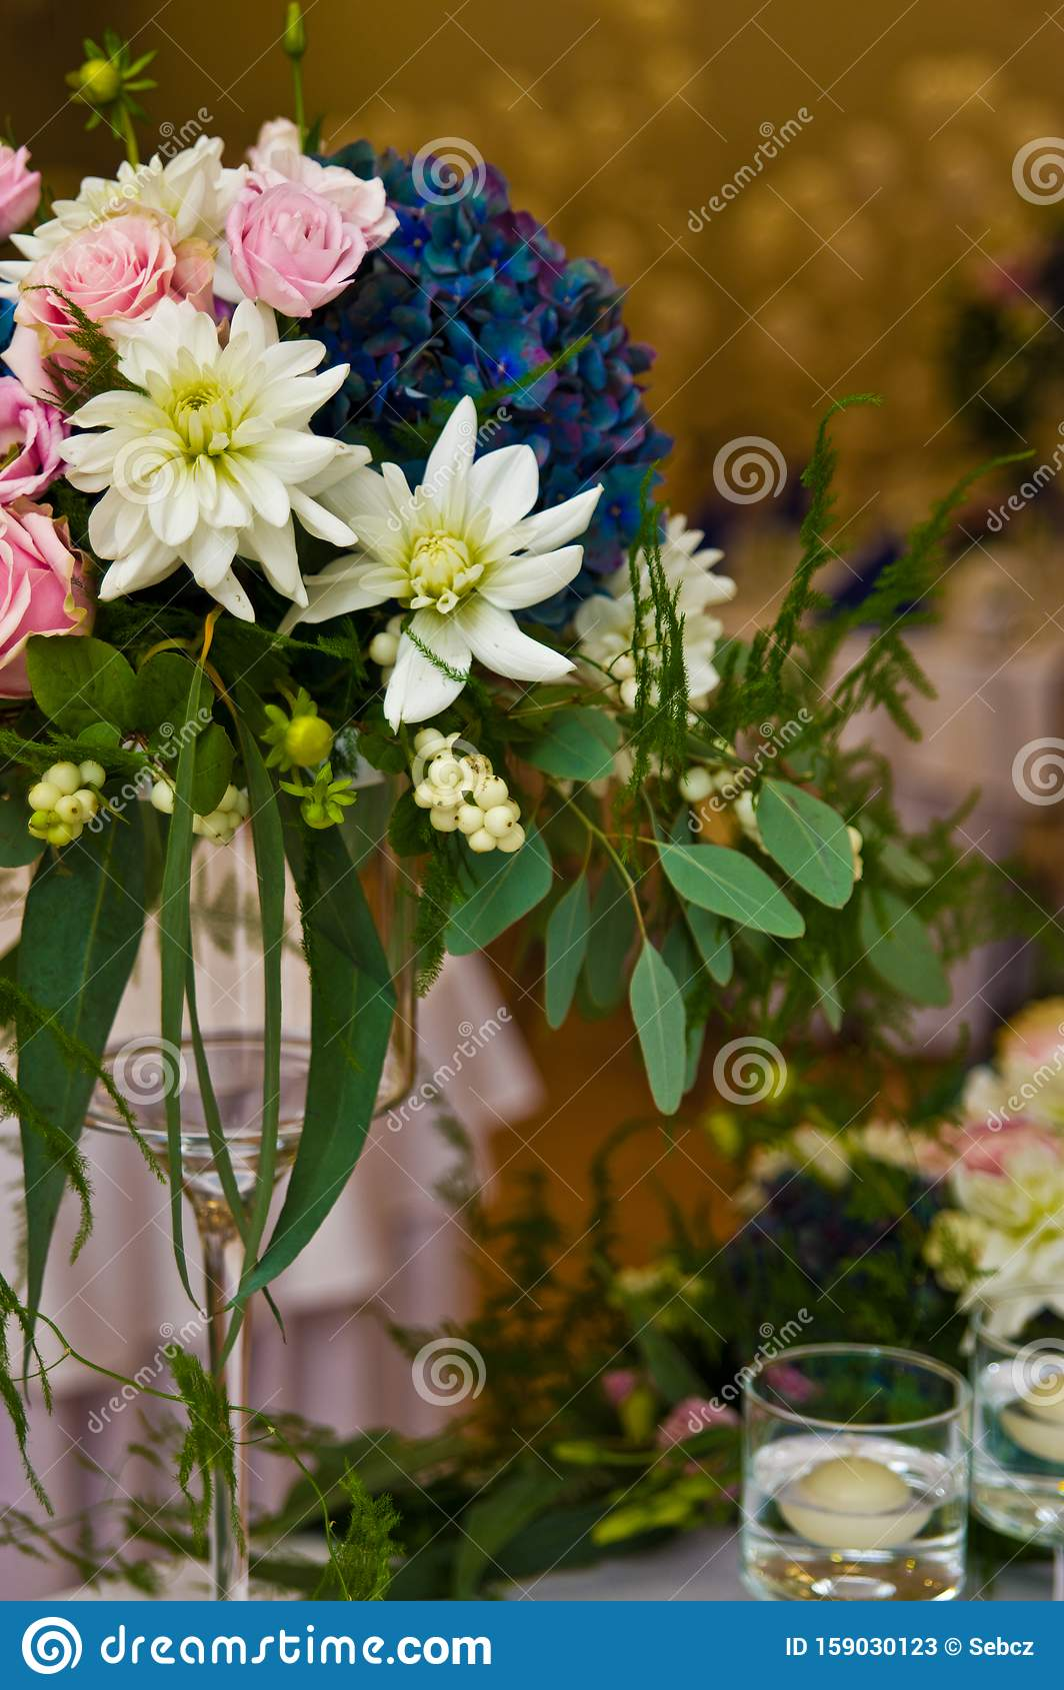 Wedding Hall Table Flowers Decoration Detail Stock Image Image Of Ballroom Flower 159030123